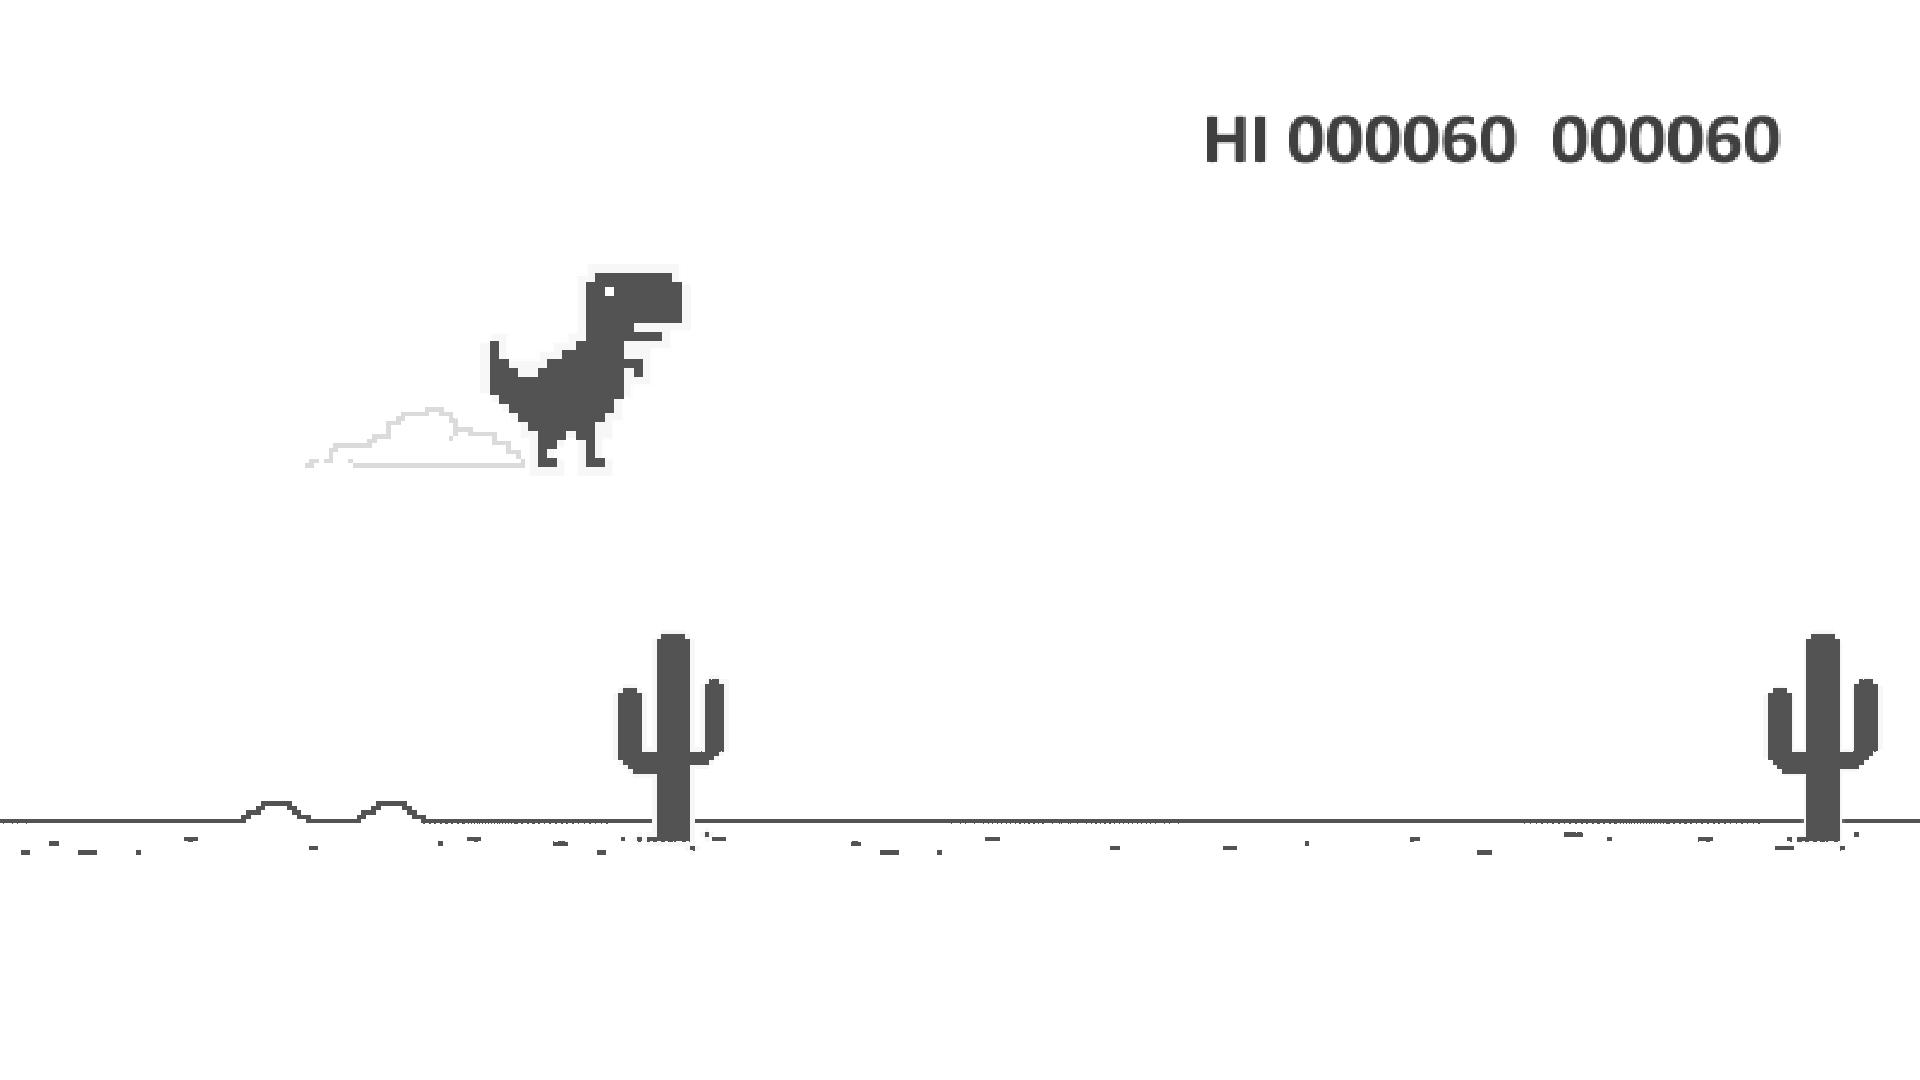 Dino T-Rex для Android Аркады  - screenshot_2017-01-15-16-09-43-545_com.deerslab.dinotrex